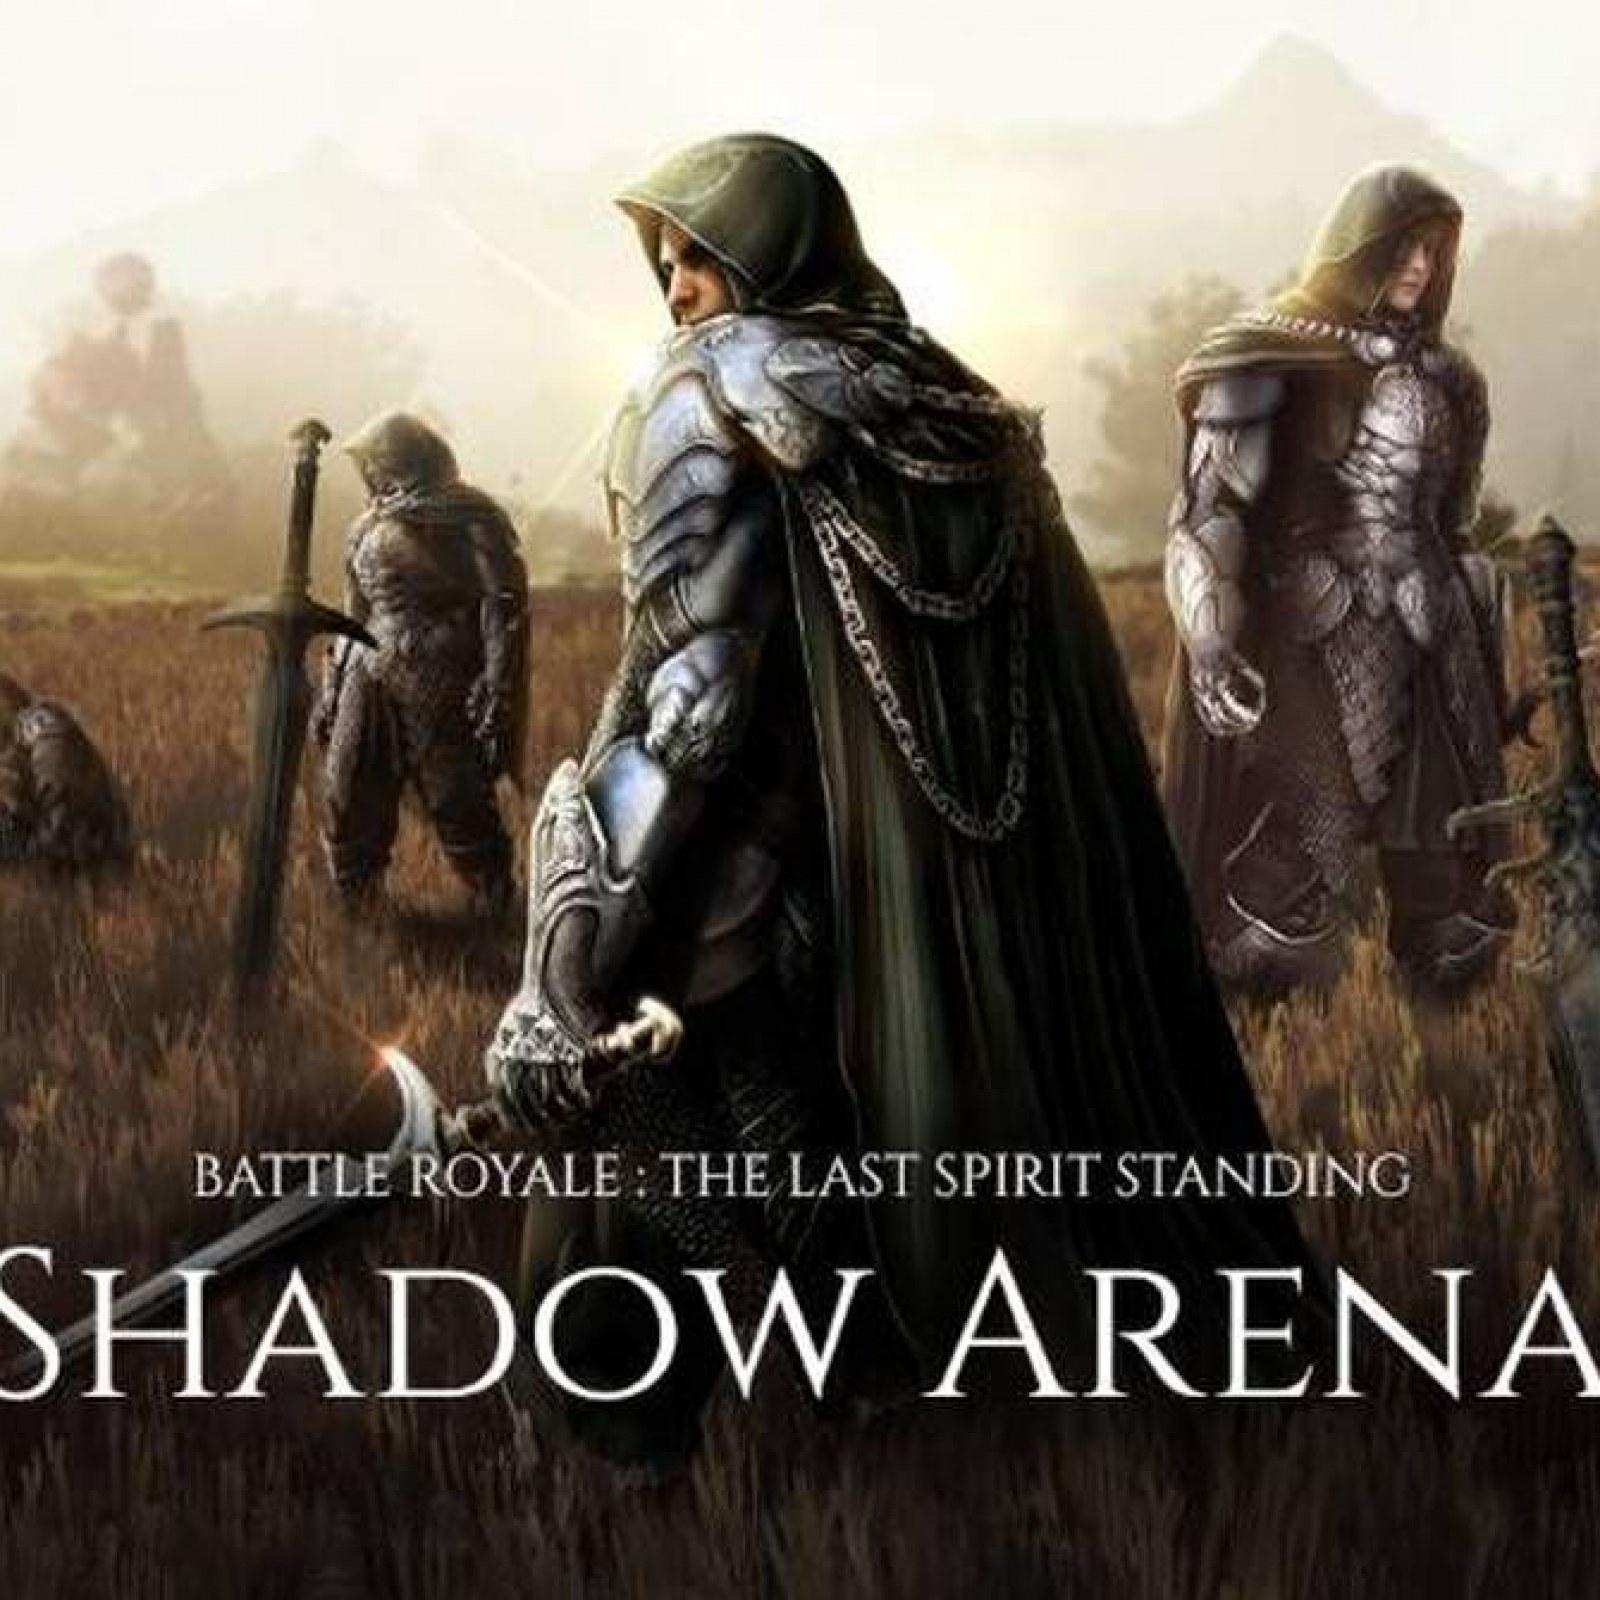 BDO' Patch Notes: Update Brings Shadow Arena, Golden Drop